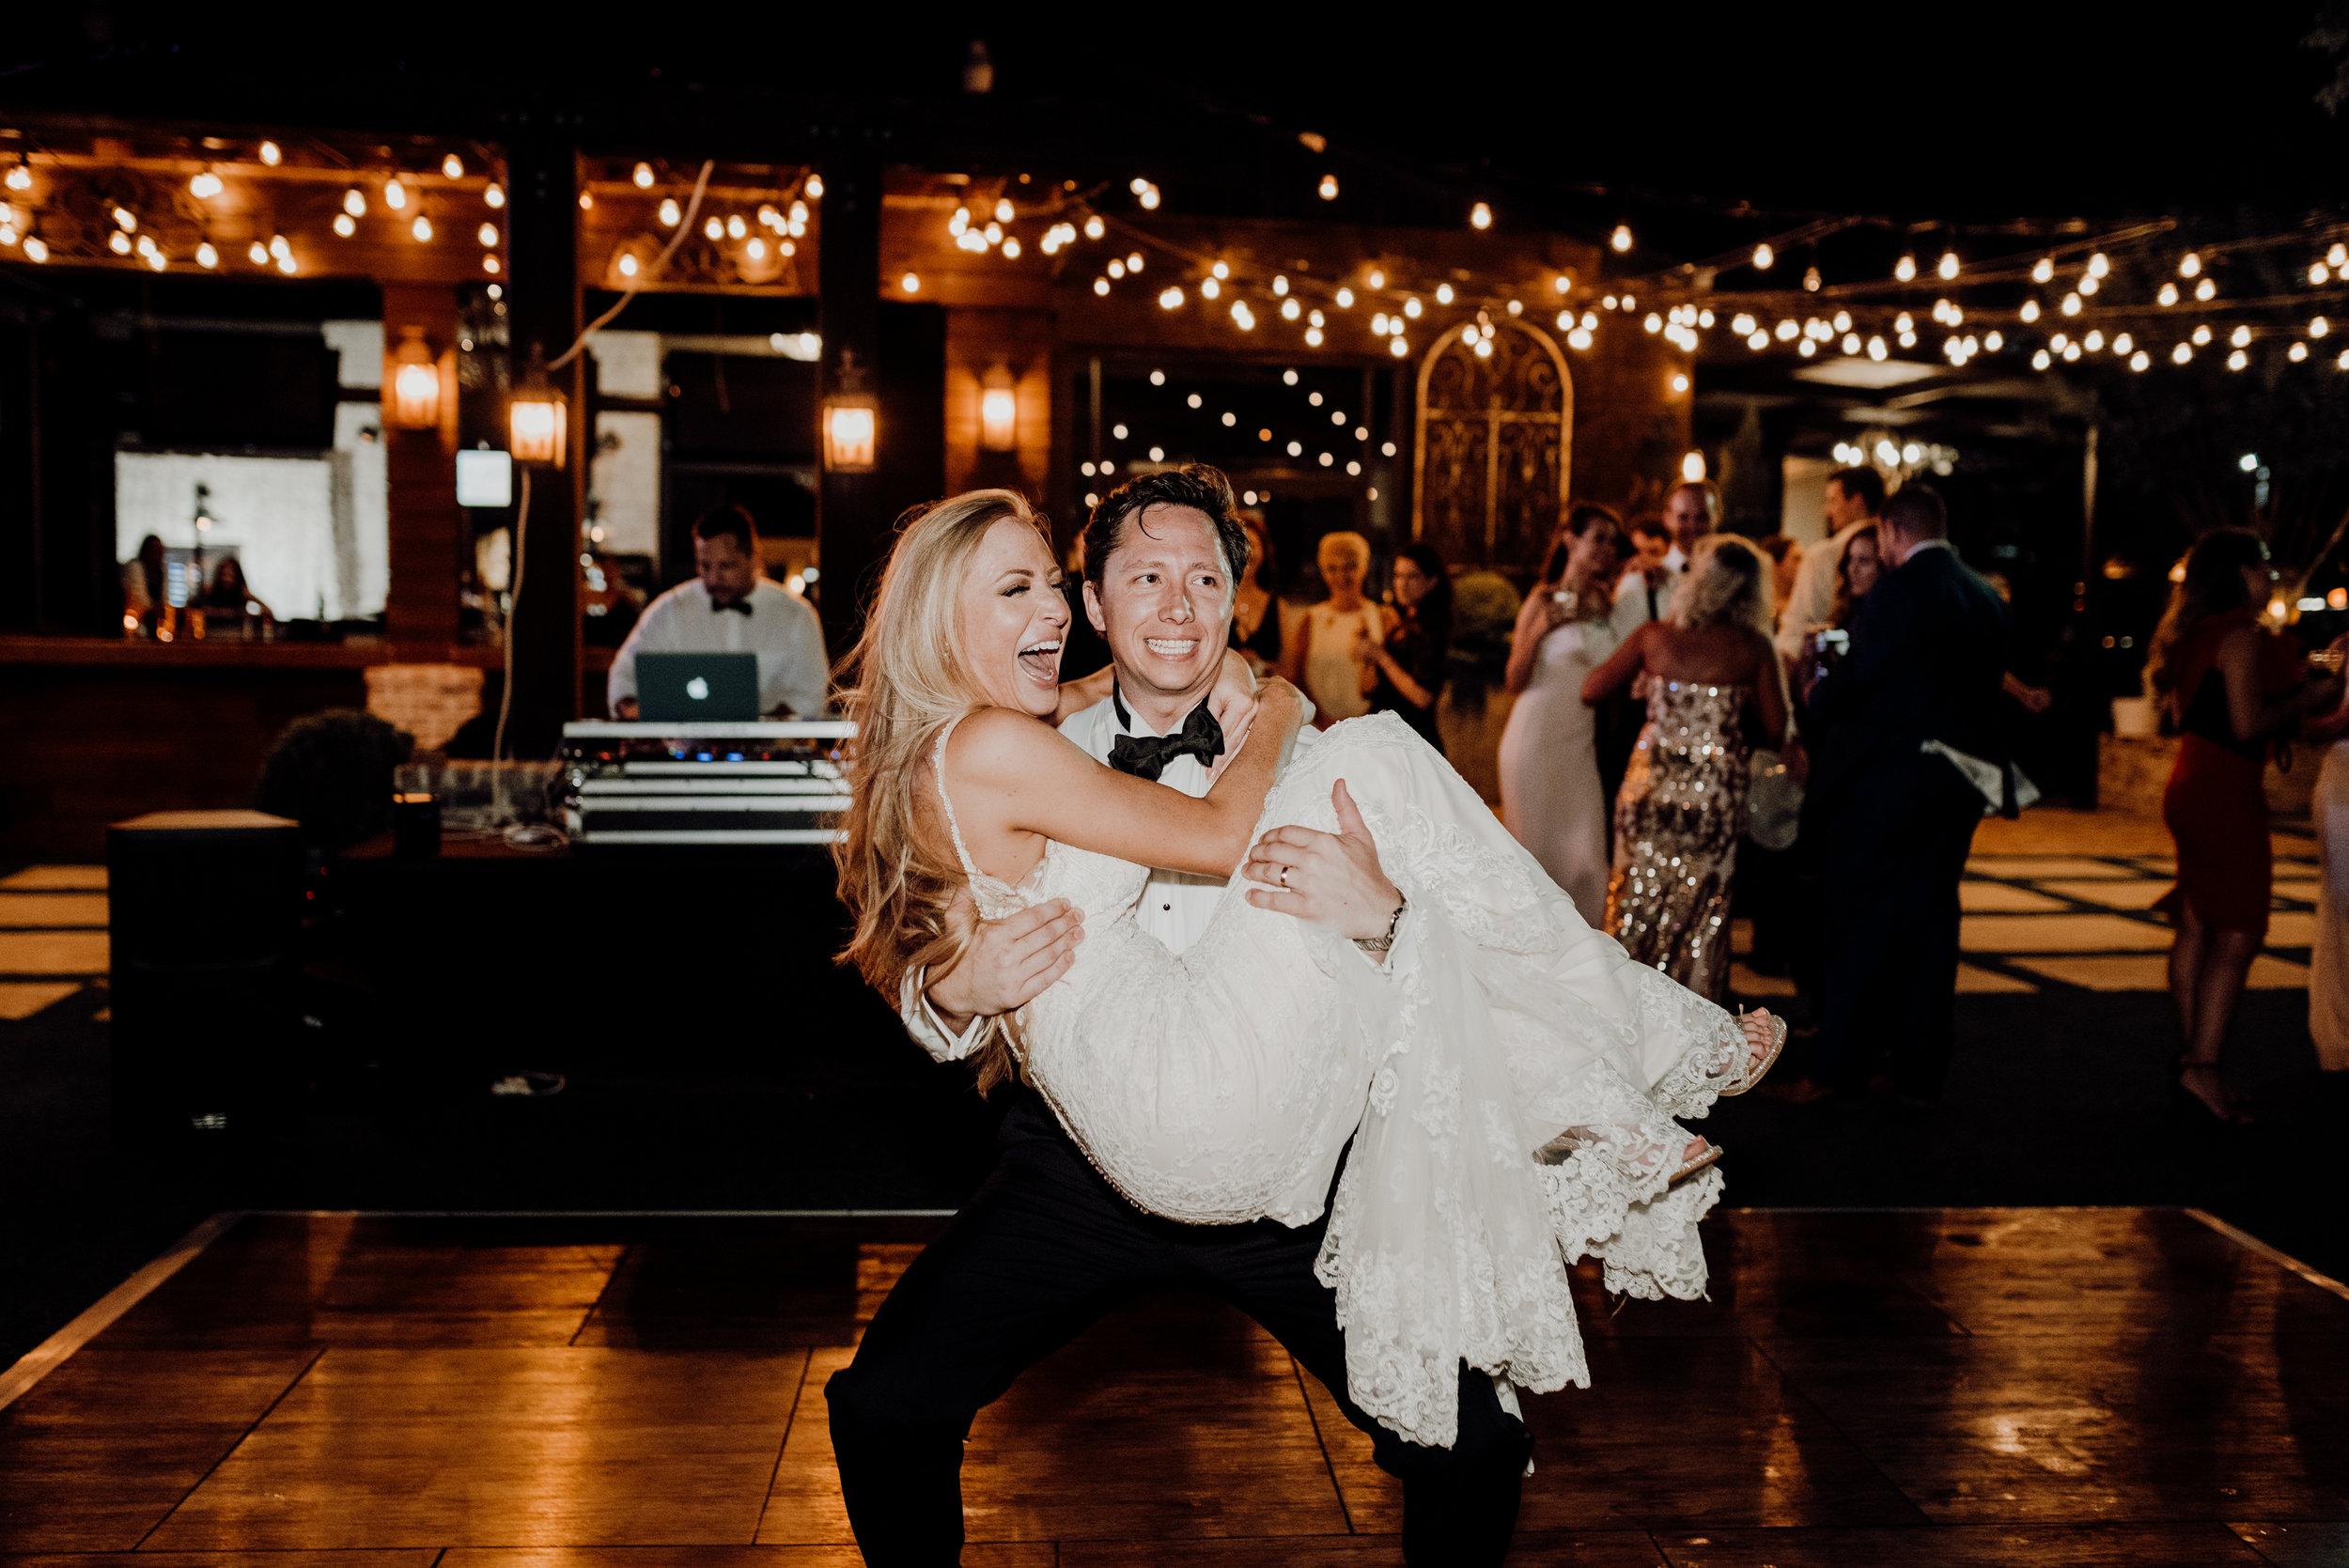 2018-05-19-Shelby + Houston-729 - Kristen Giles Photography - Houston, Texas Wedding and Elopement Photographer - 731.jpg